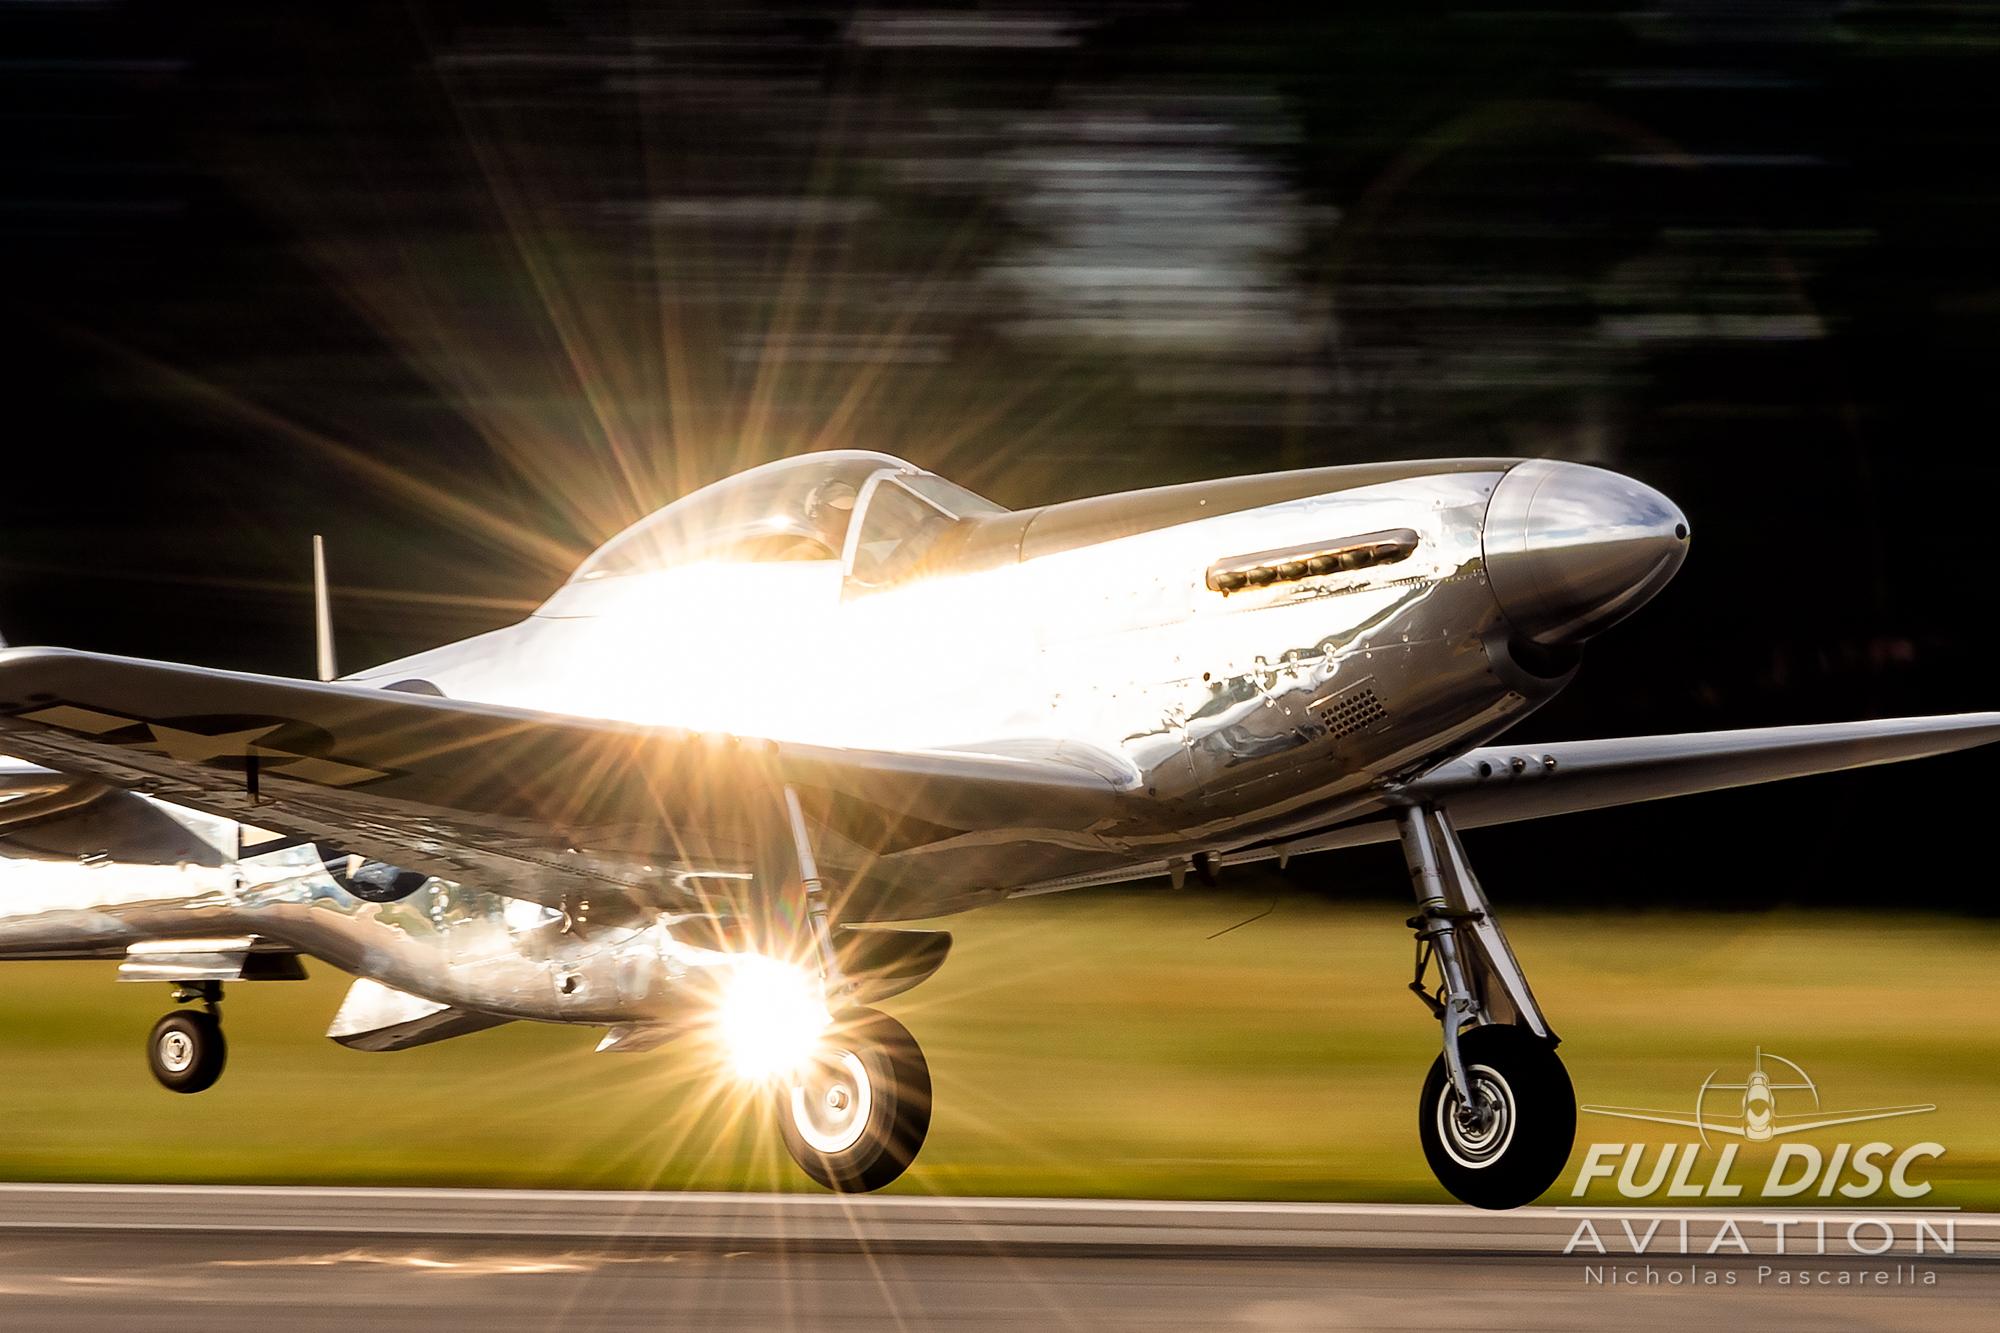 andrewmckenna_fulldiscaviation_nickpascarella_takeoff_reflection_sunset_mustang_p51.jpg